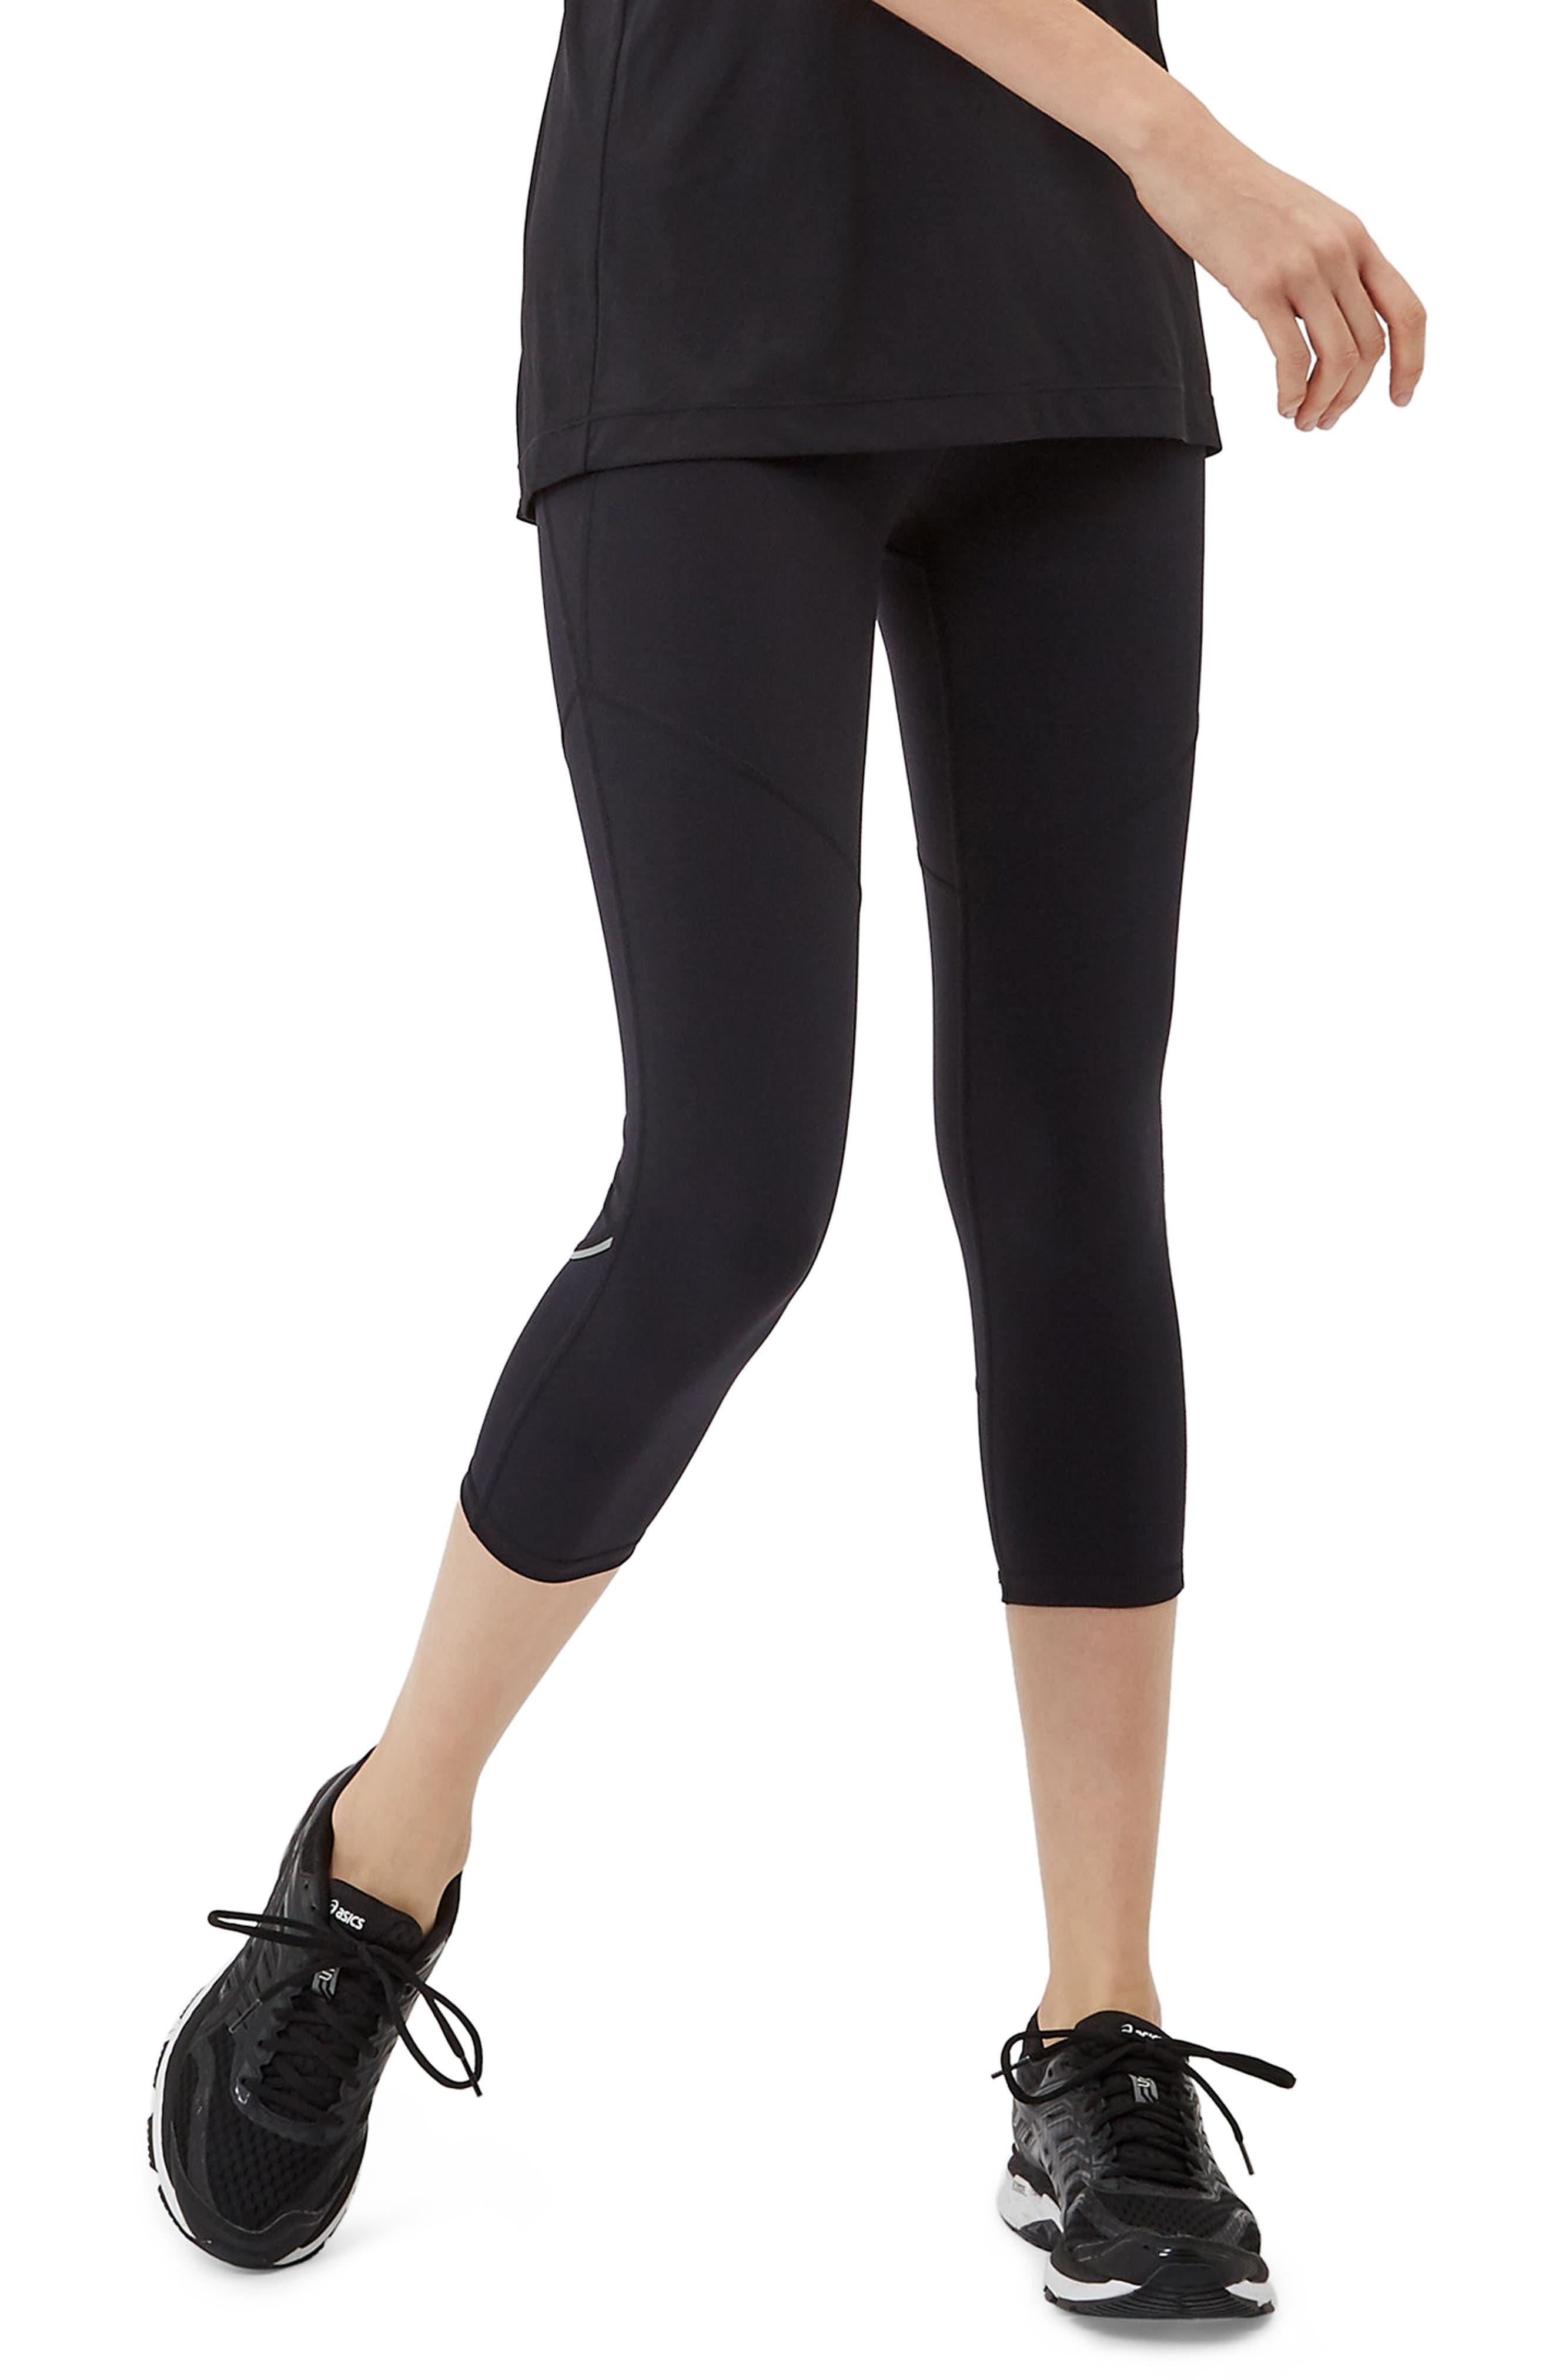 SWEATY BETTY Power Workout Crop Leggings, Main, color, BLACK